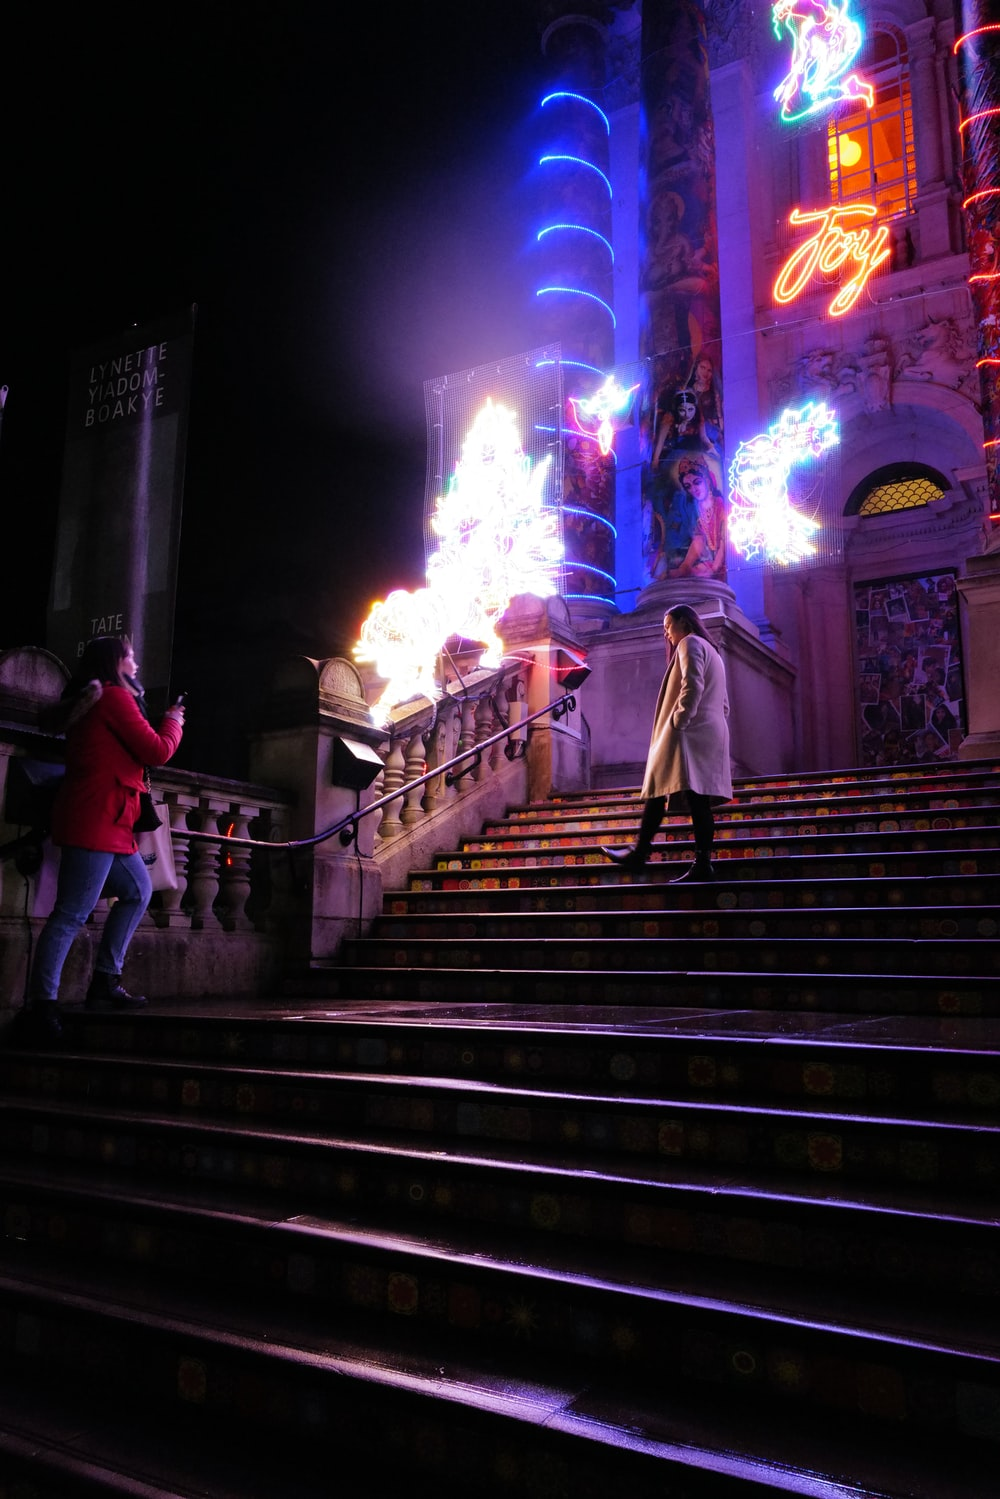 people walking on stairs during nighttime